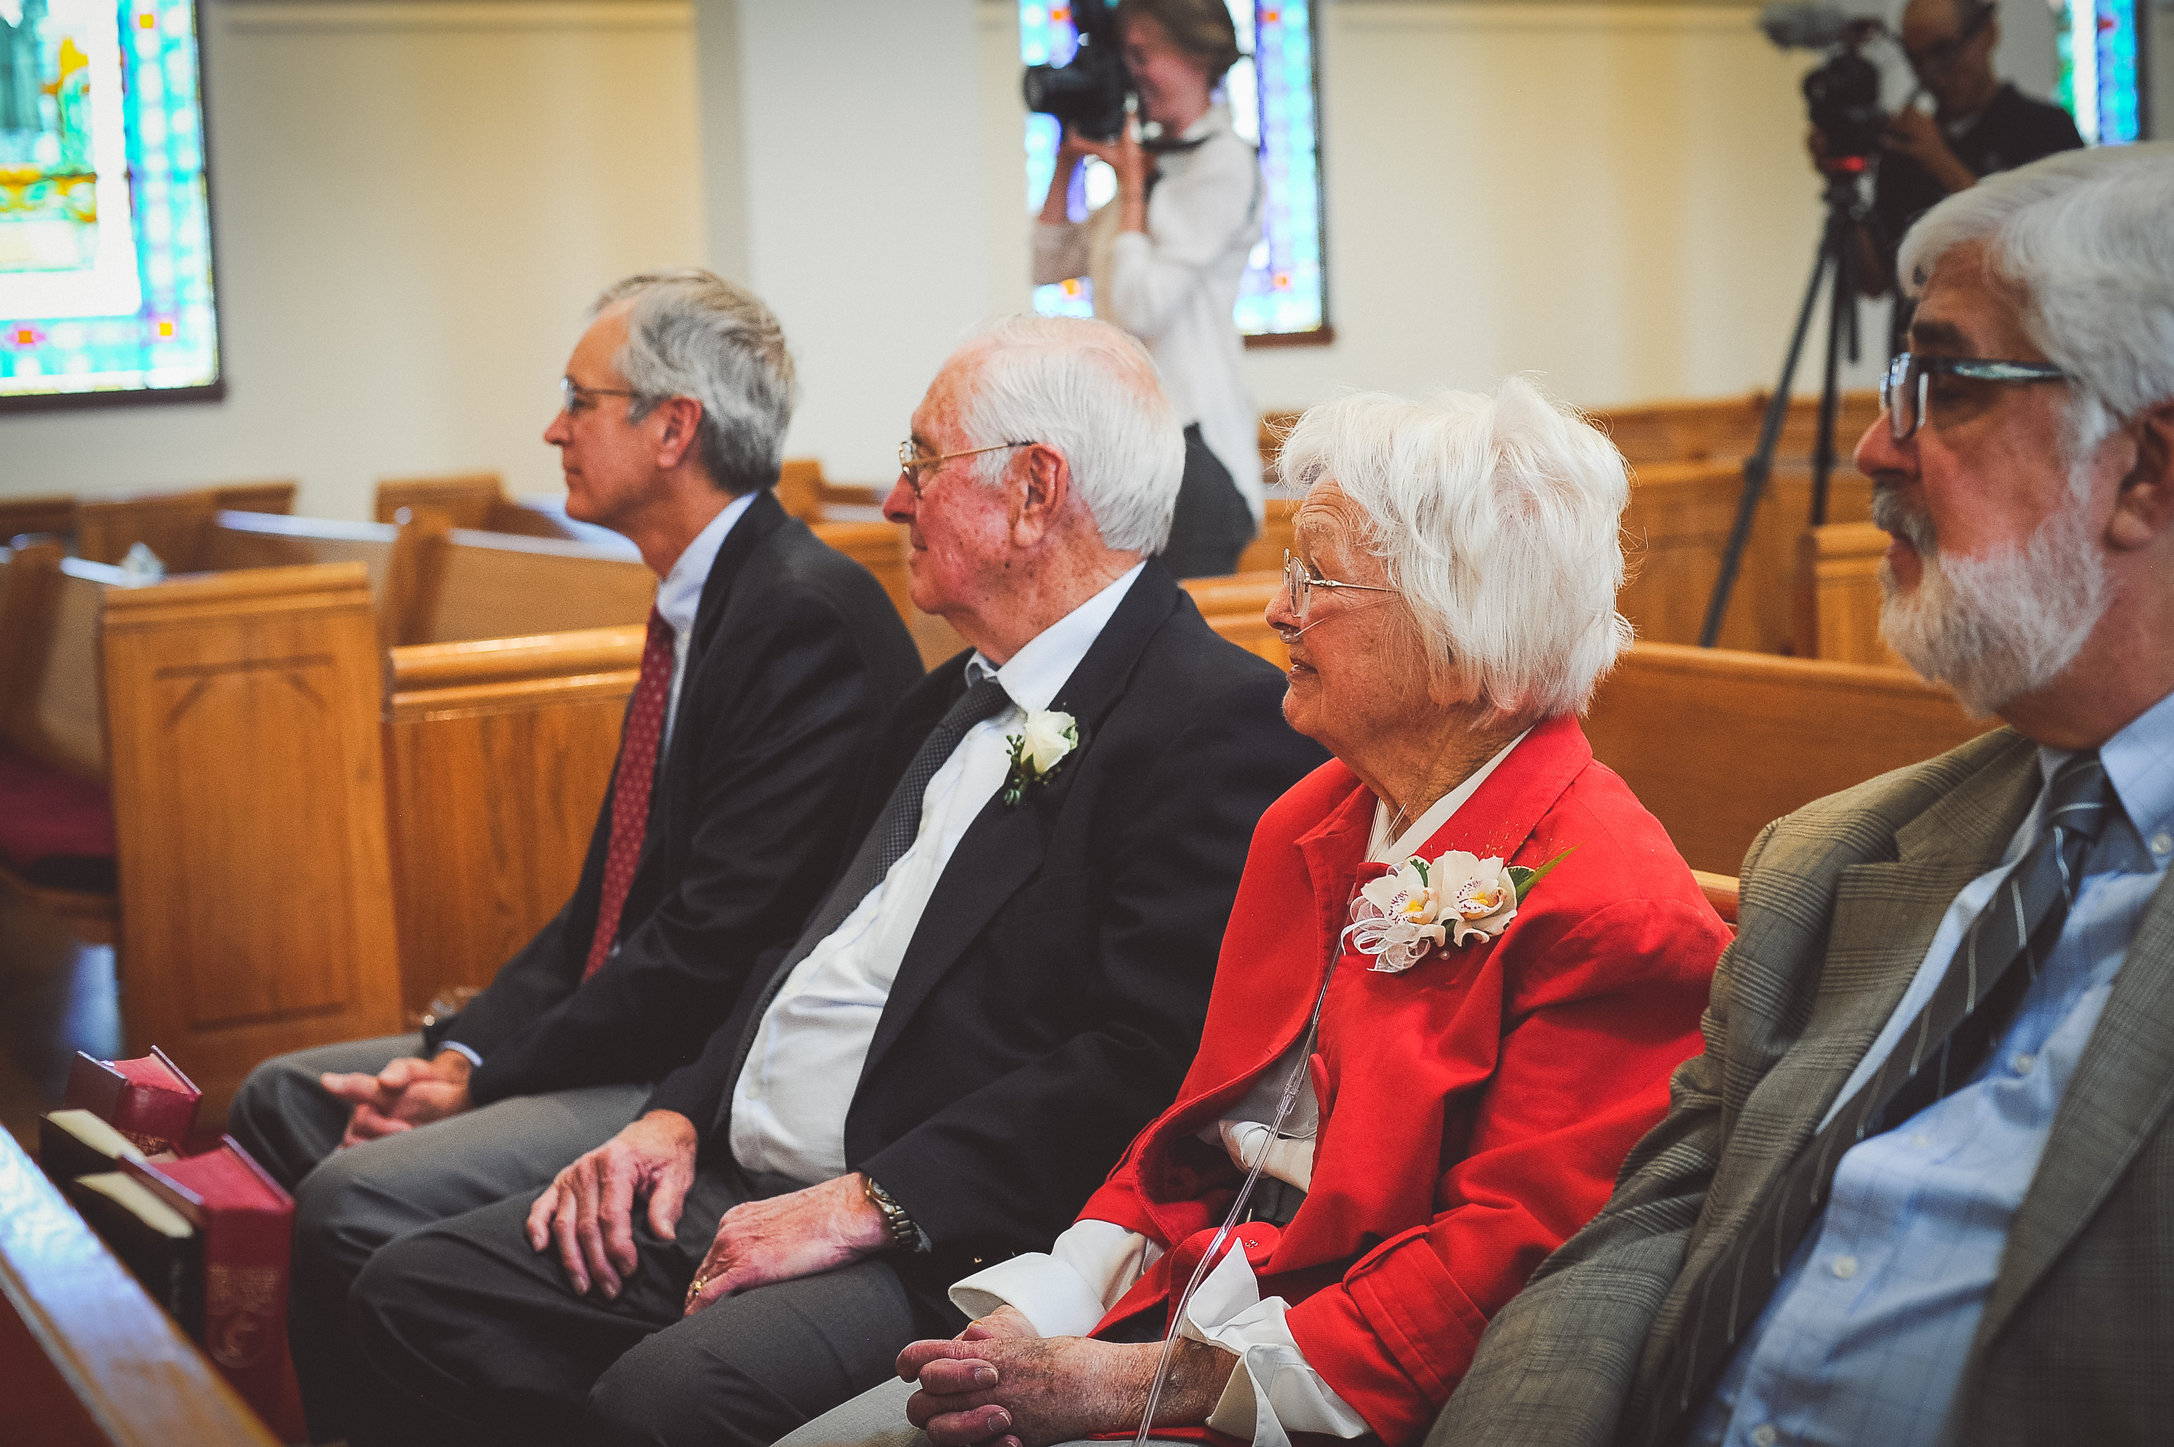 SandC-wedding-254.jpg